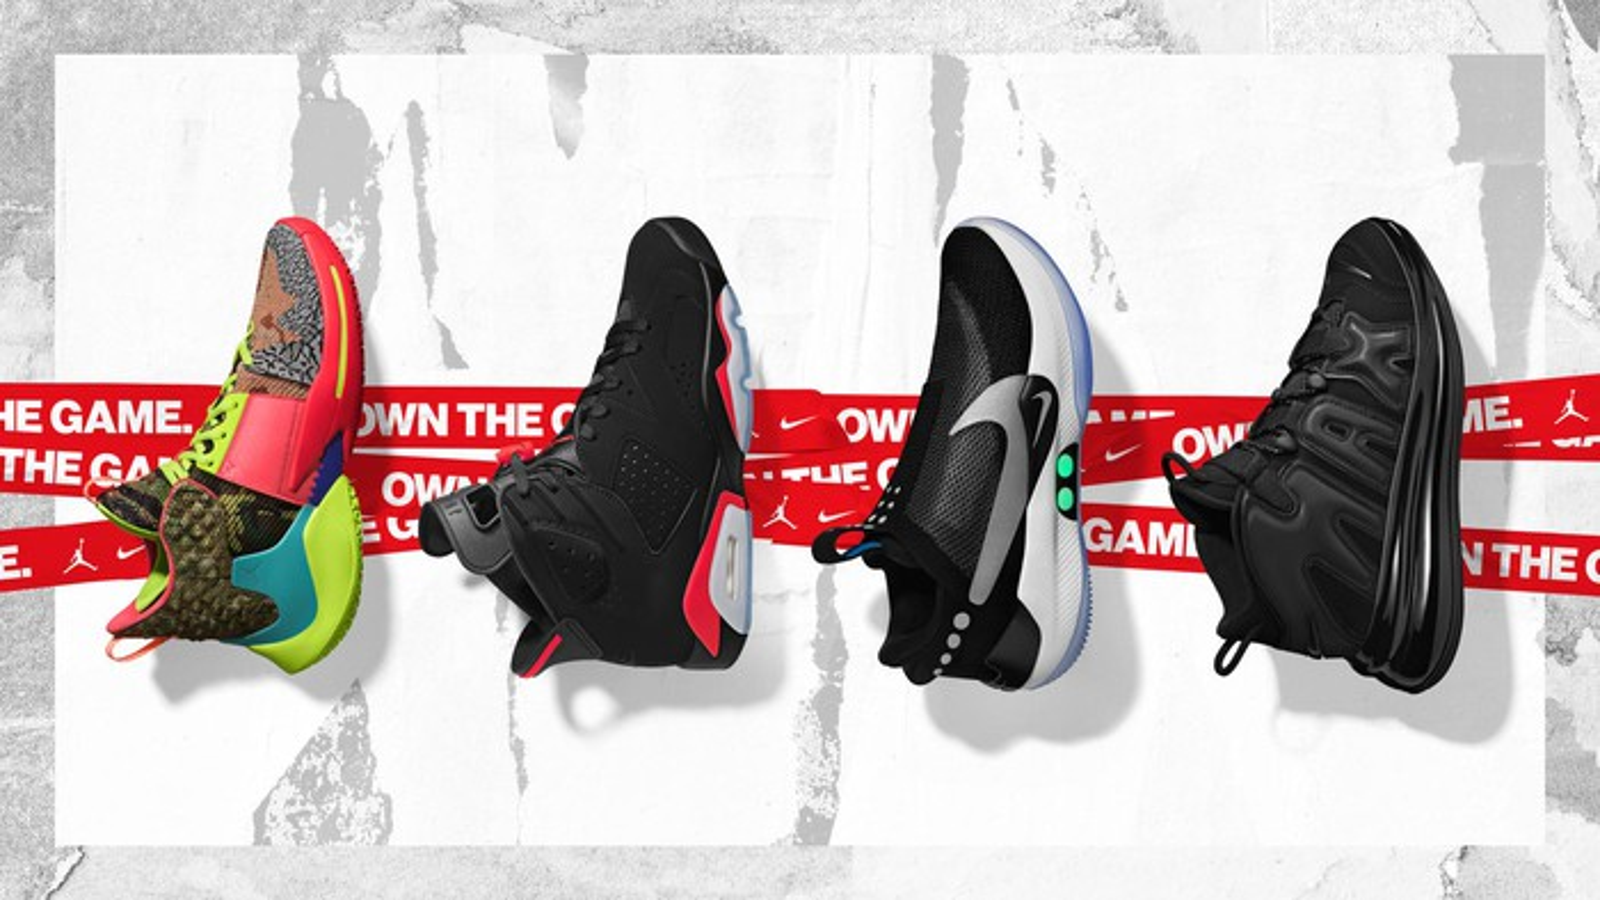 A selection of Nike basketball shoes.